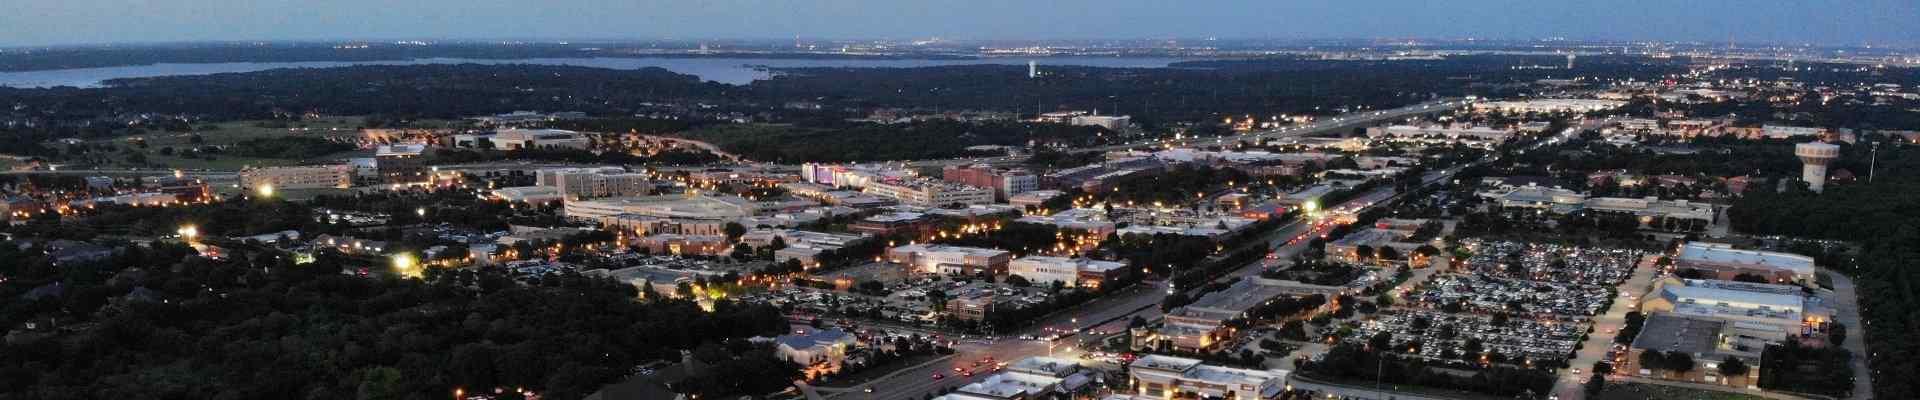 skyline view of southlake texas